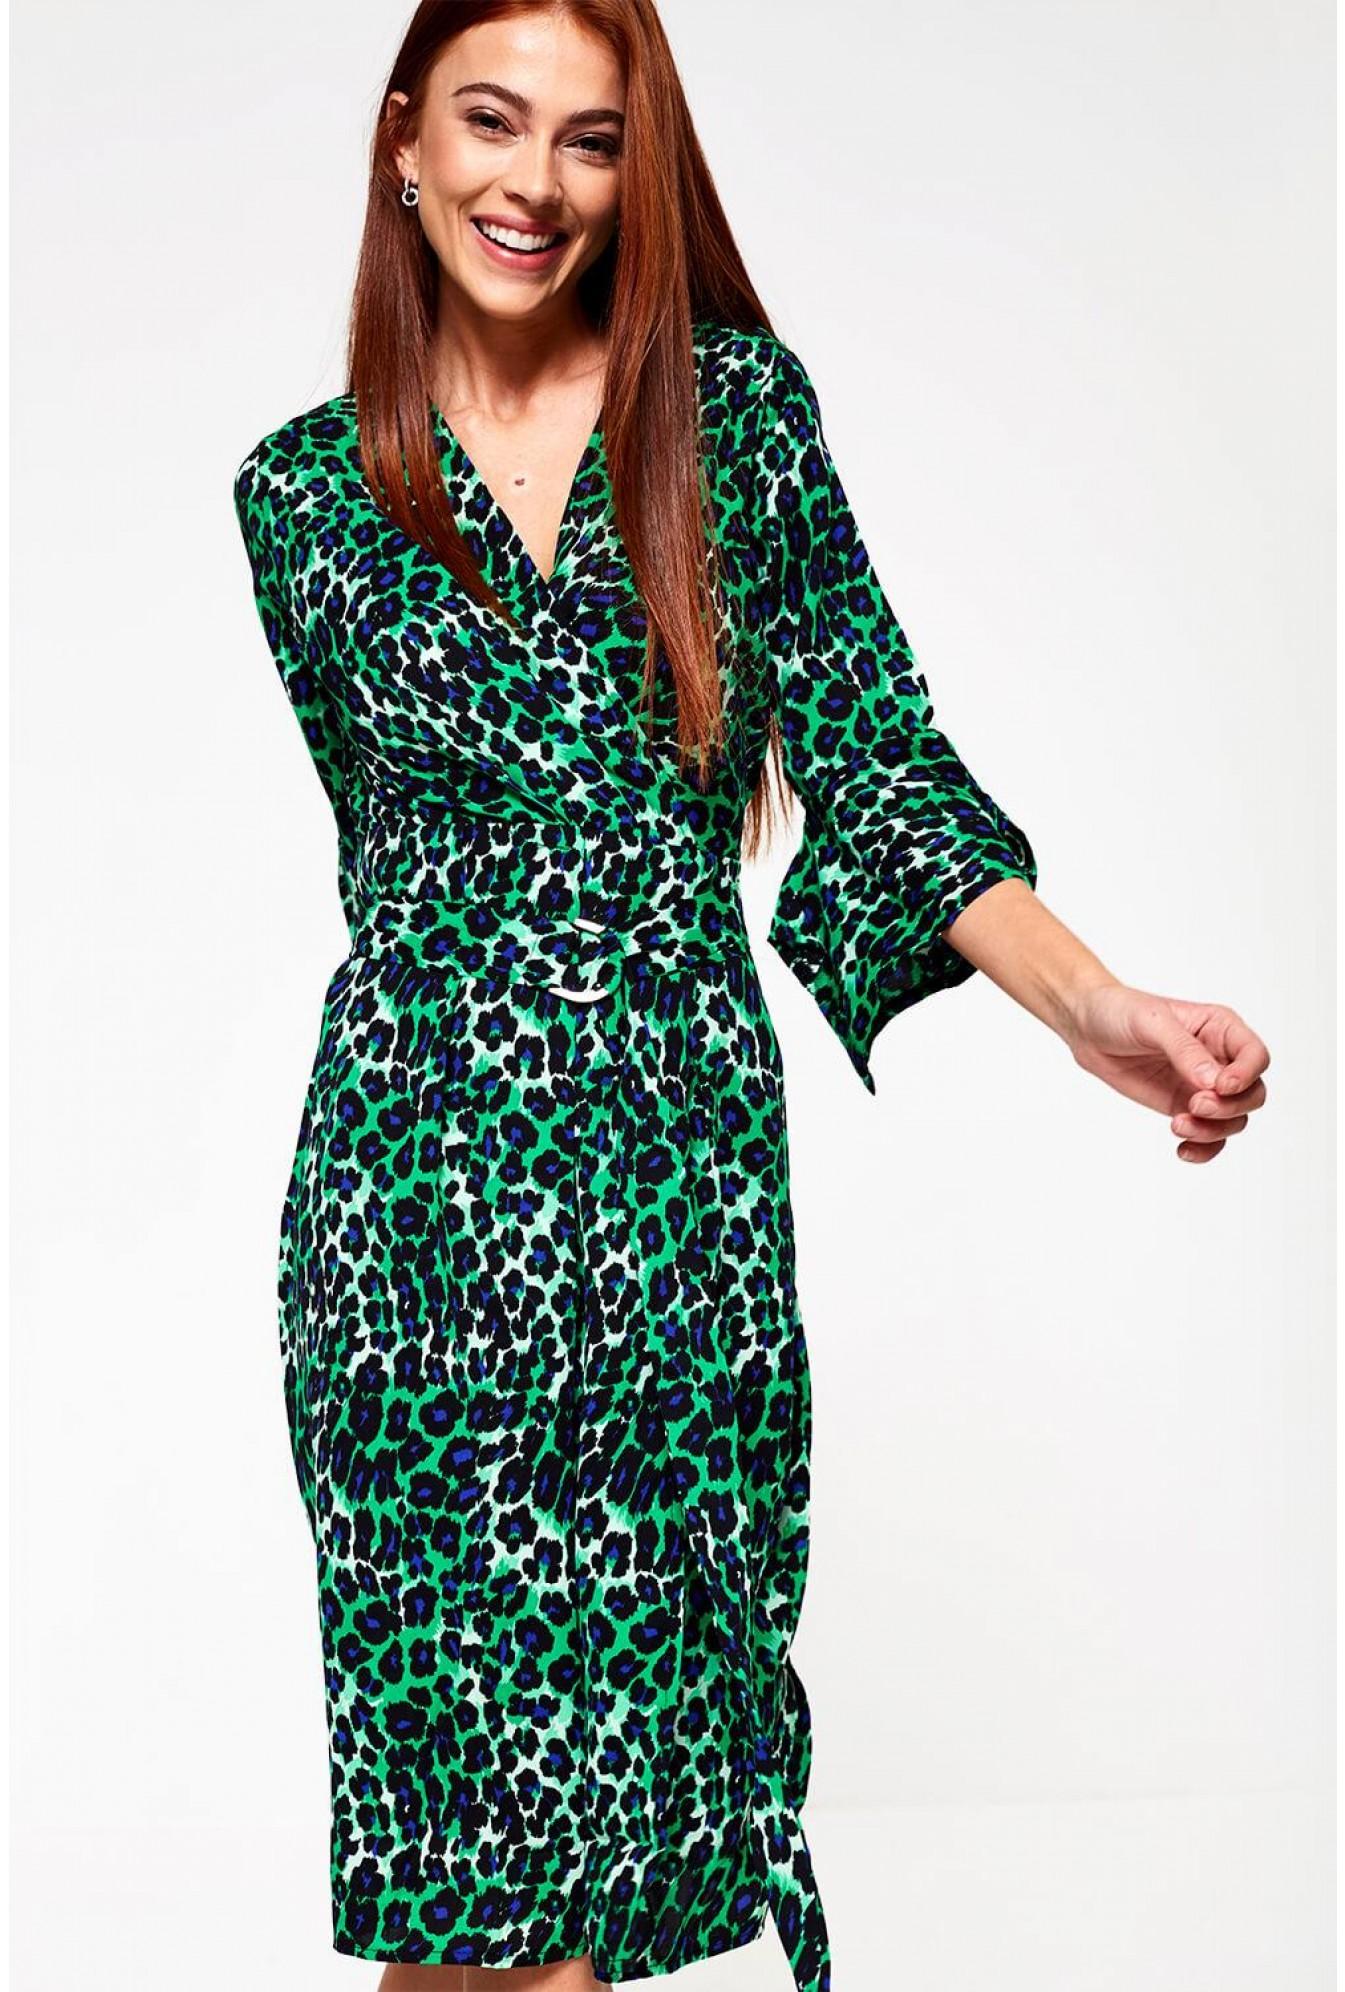 ccd5ab72c9eb Elli White Angelique Midi Wrap Dress in Green Animal Print | iCLOTHING